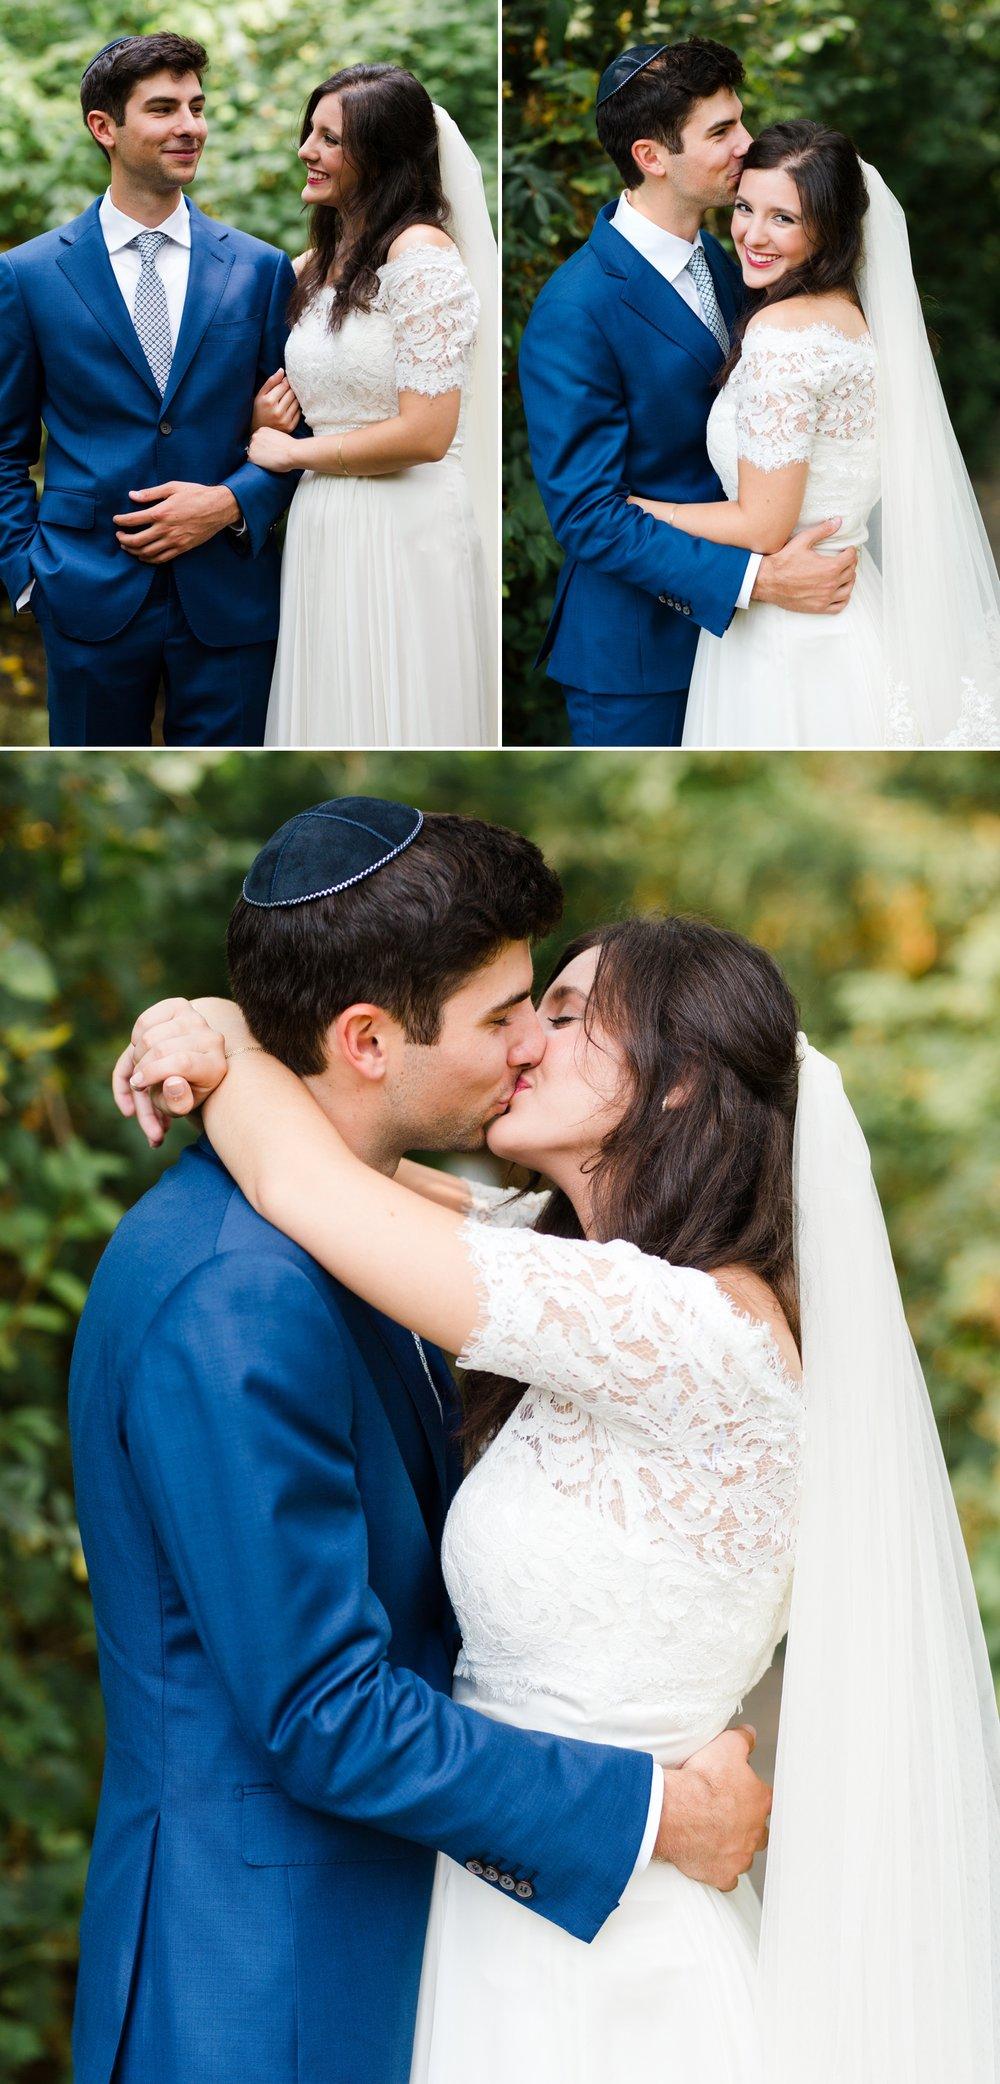 5-seattle-wedding-photographer.jpg